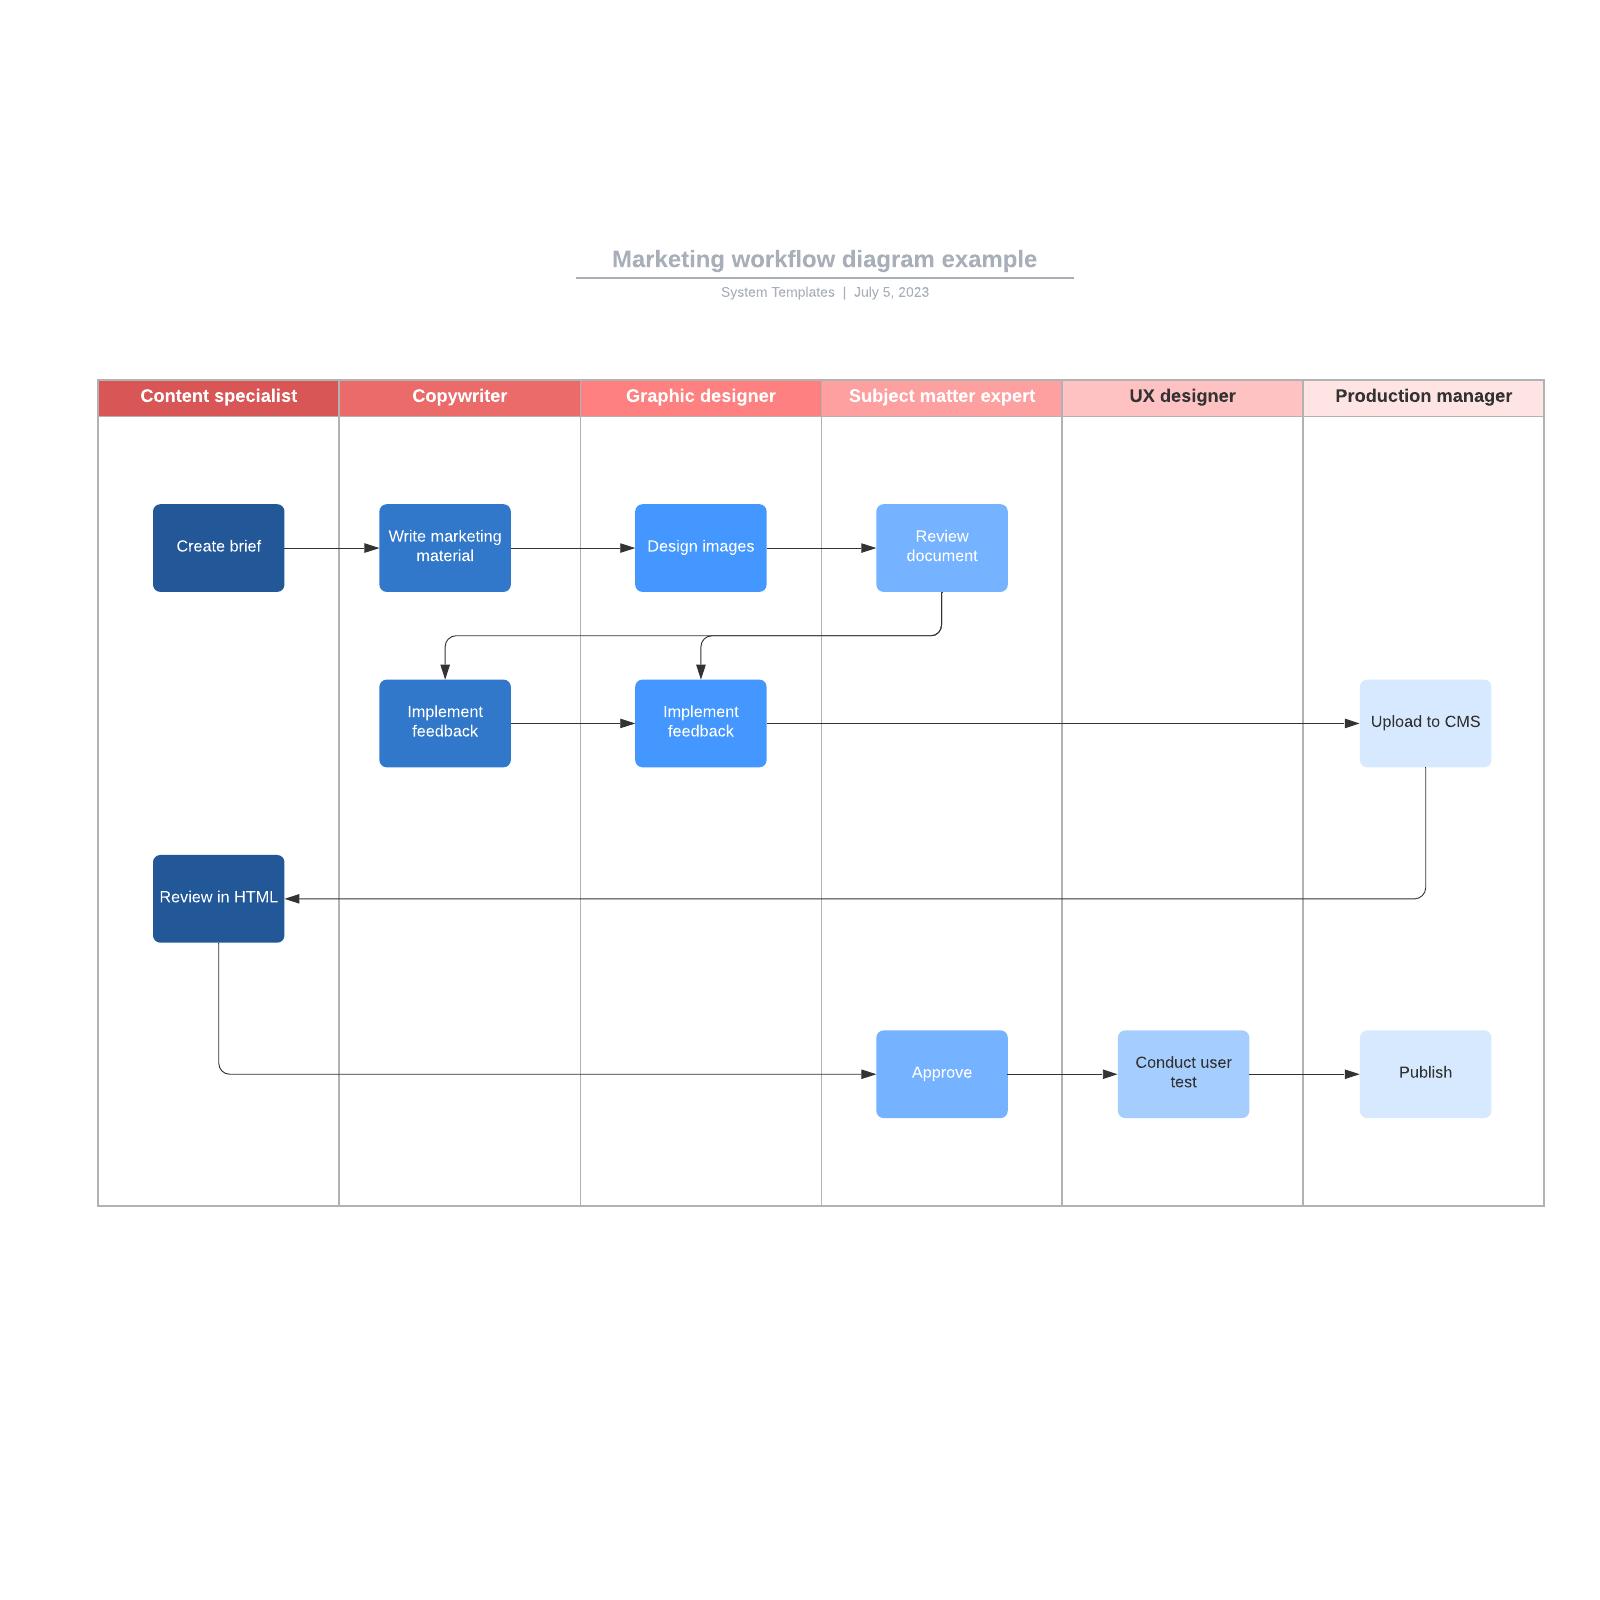 Marketing workflow diagram example